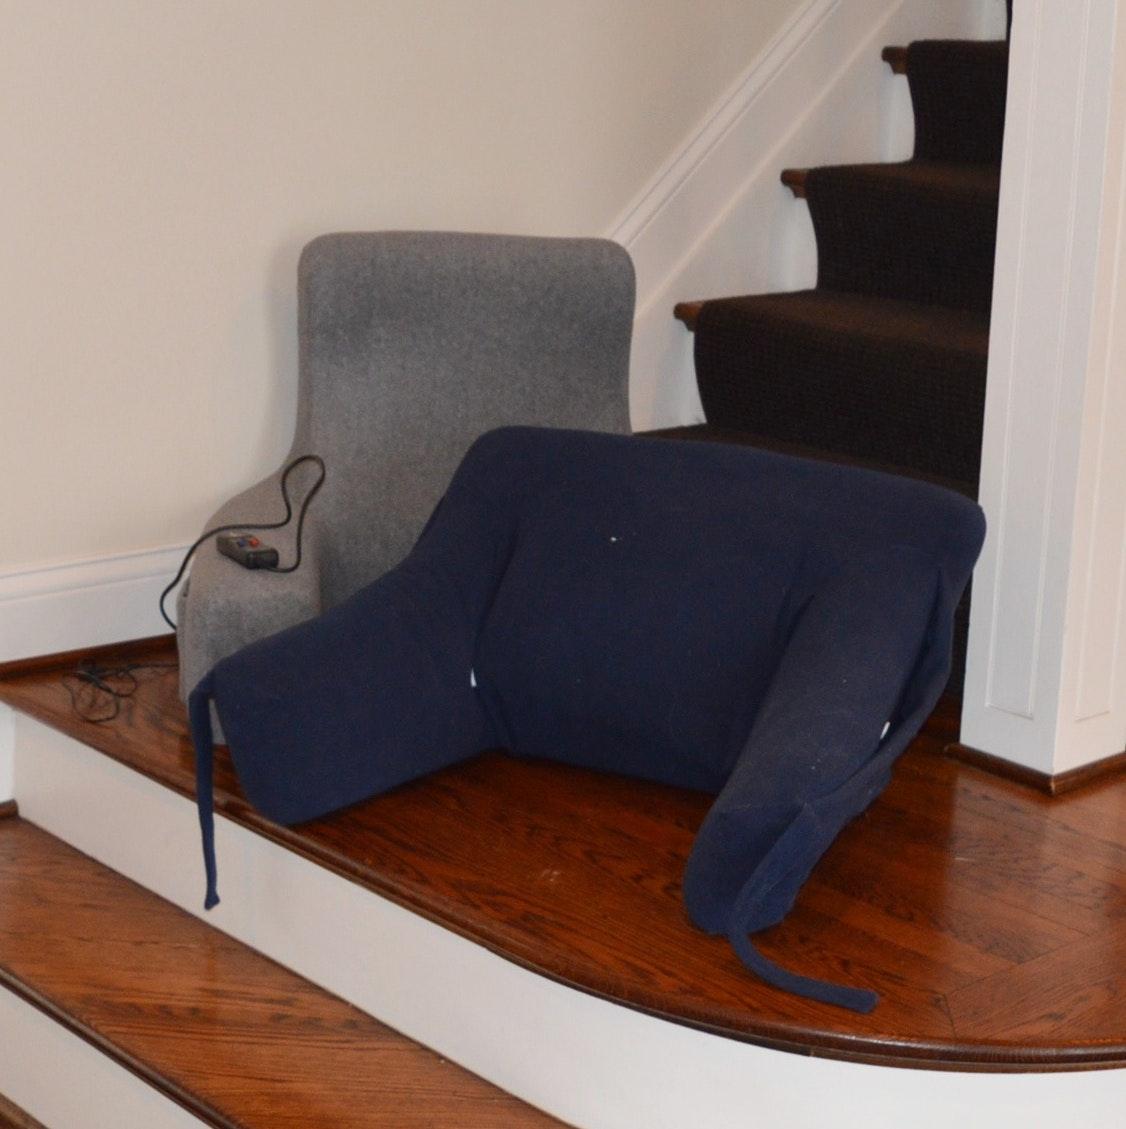 Massage Pillow and Lounger